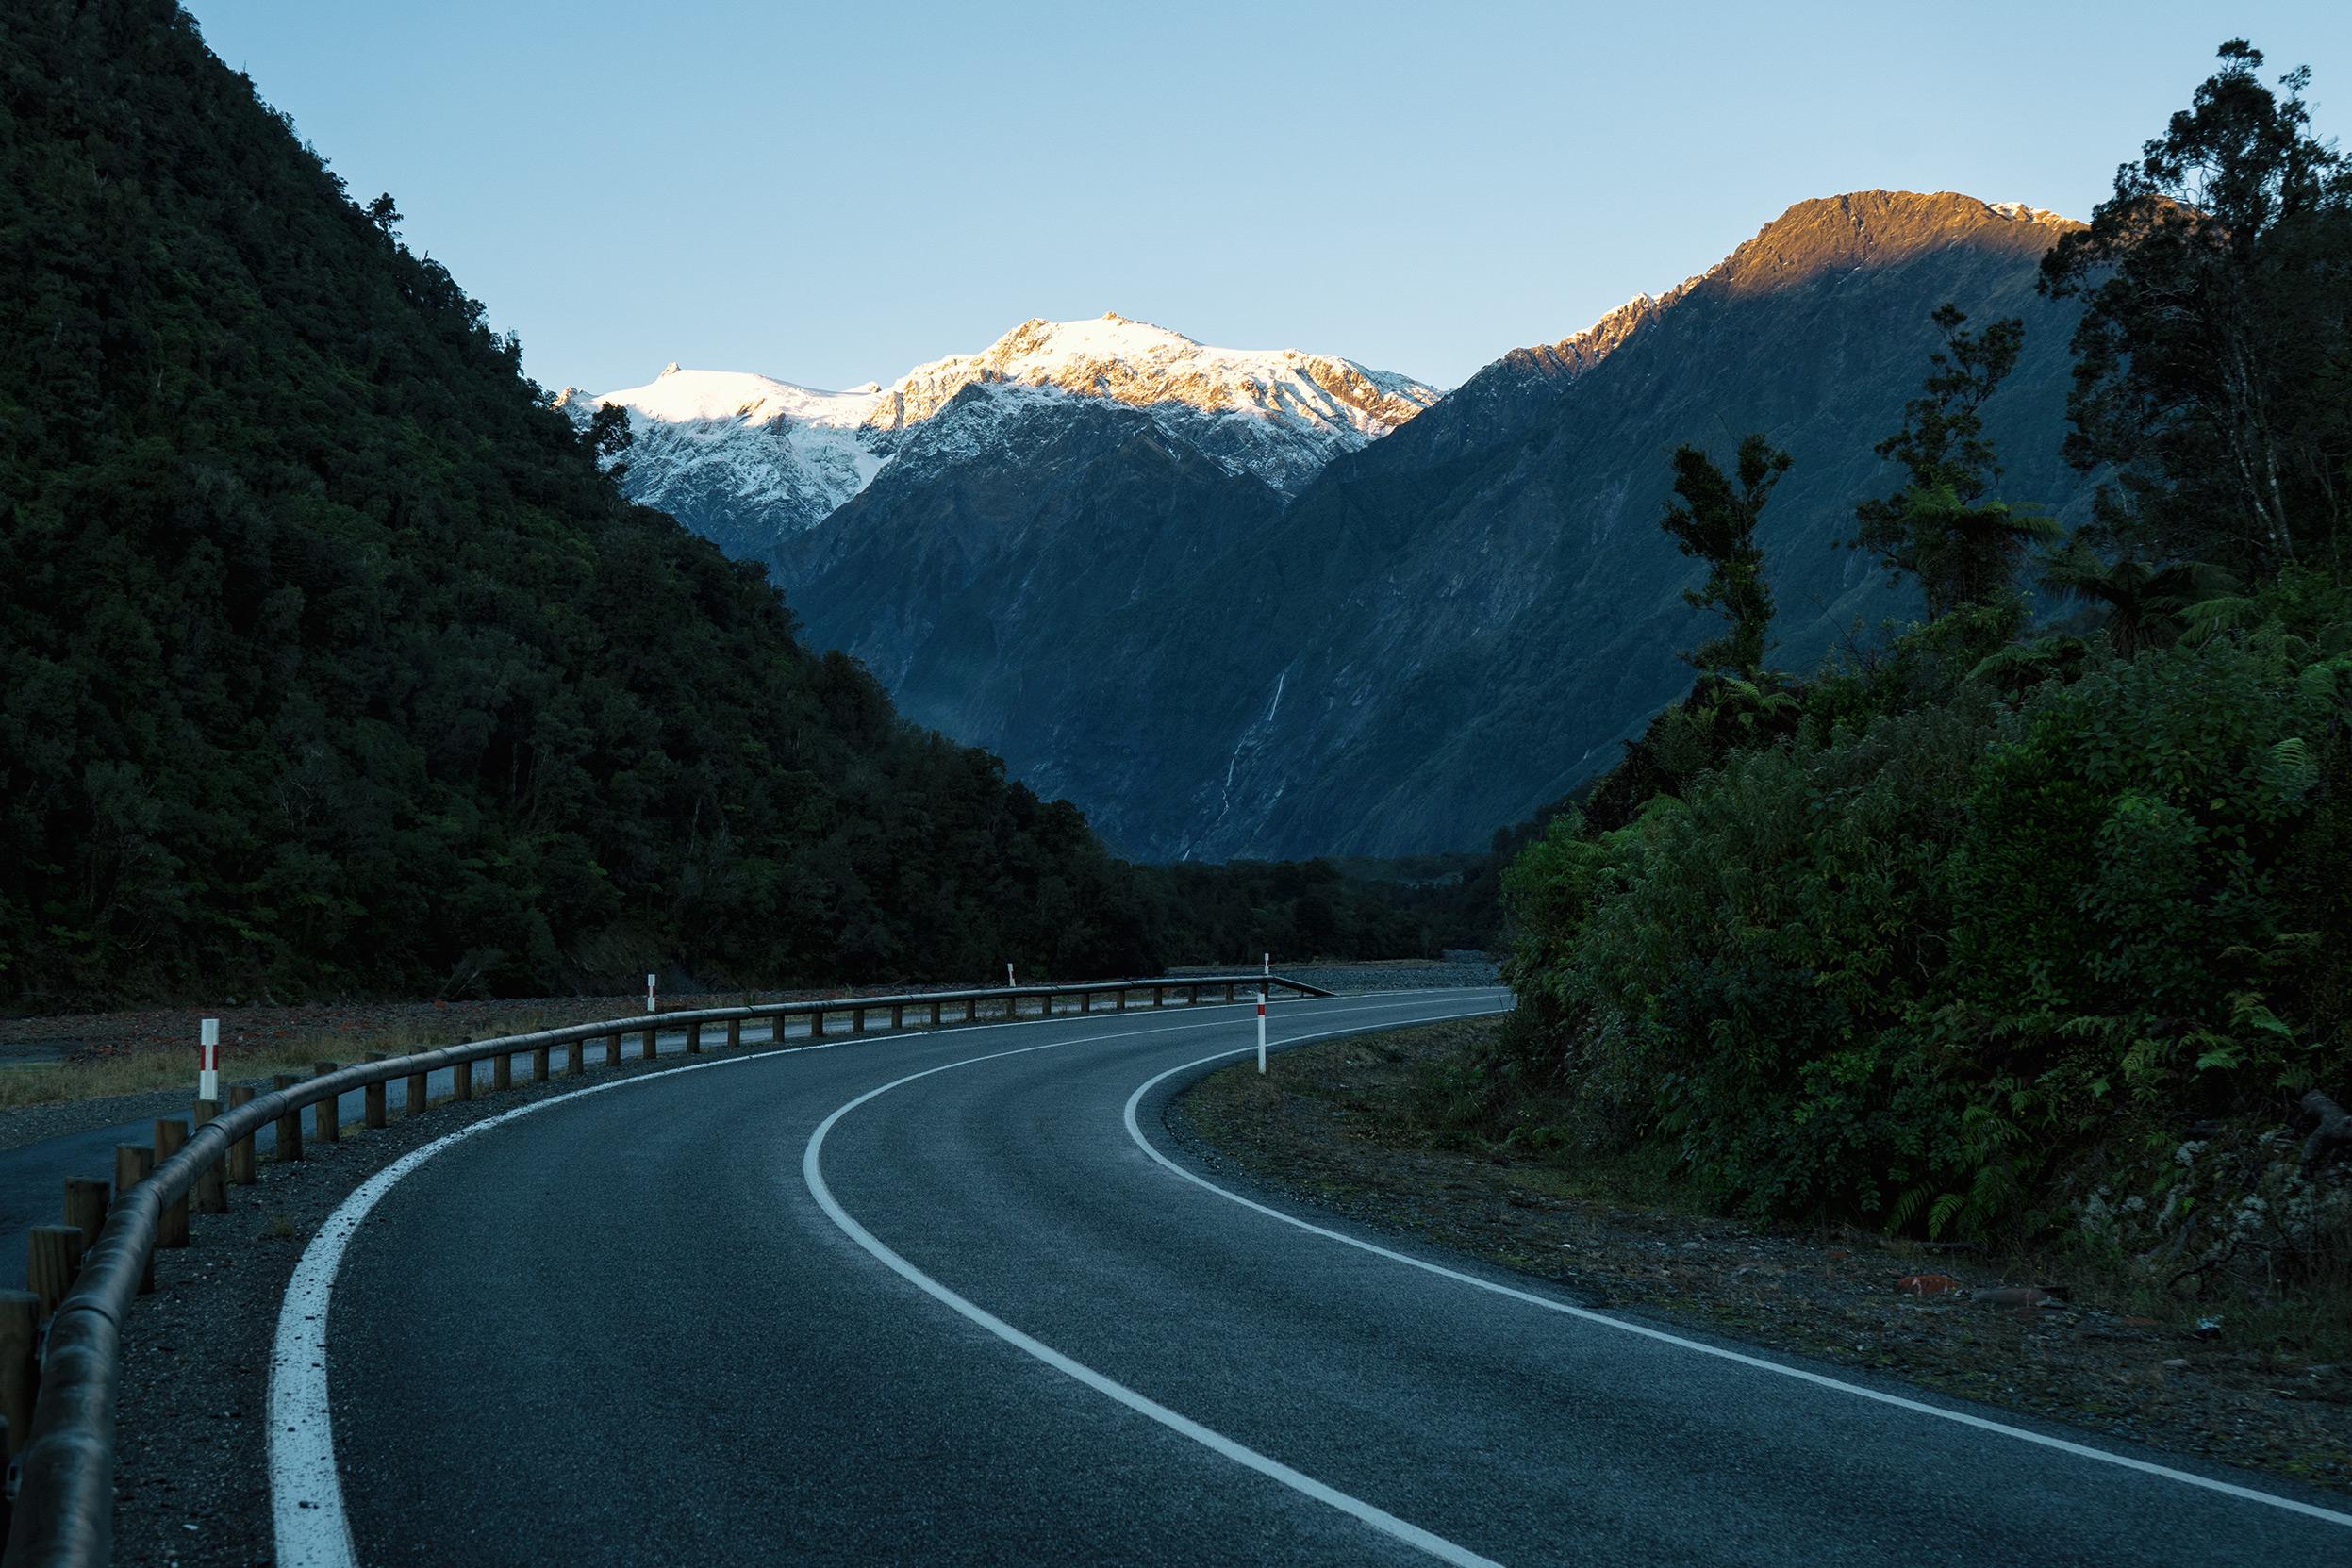 Franz Josef Glacier Road To Glacier Valley Carpark At Sunrise